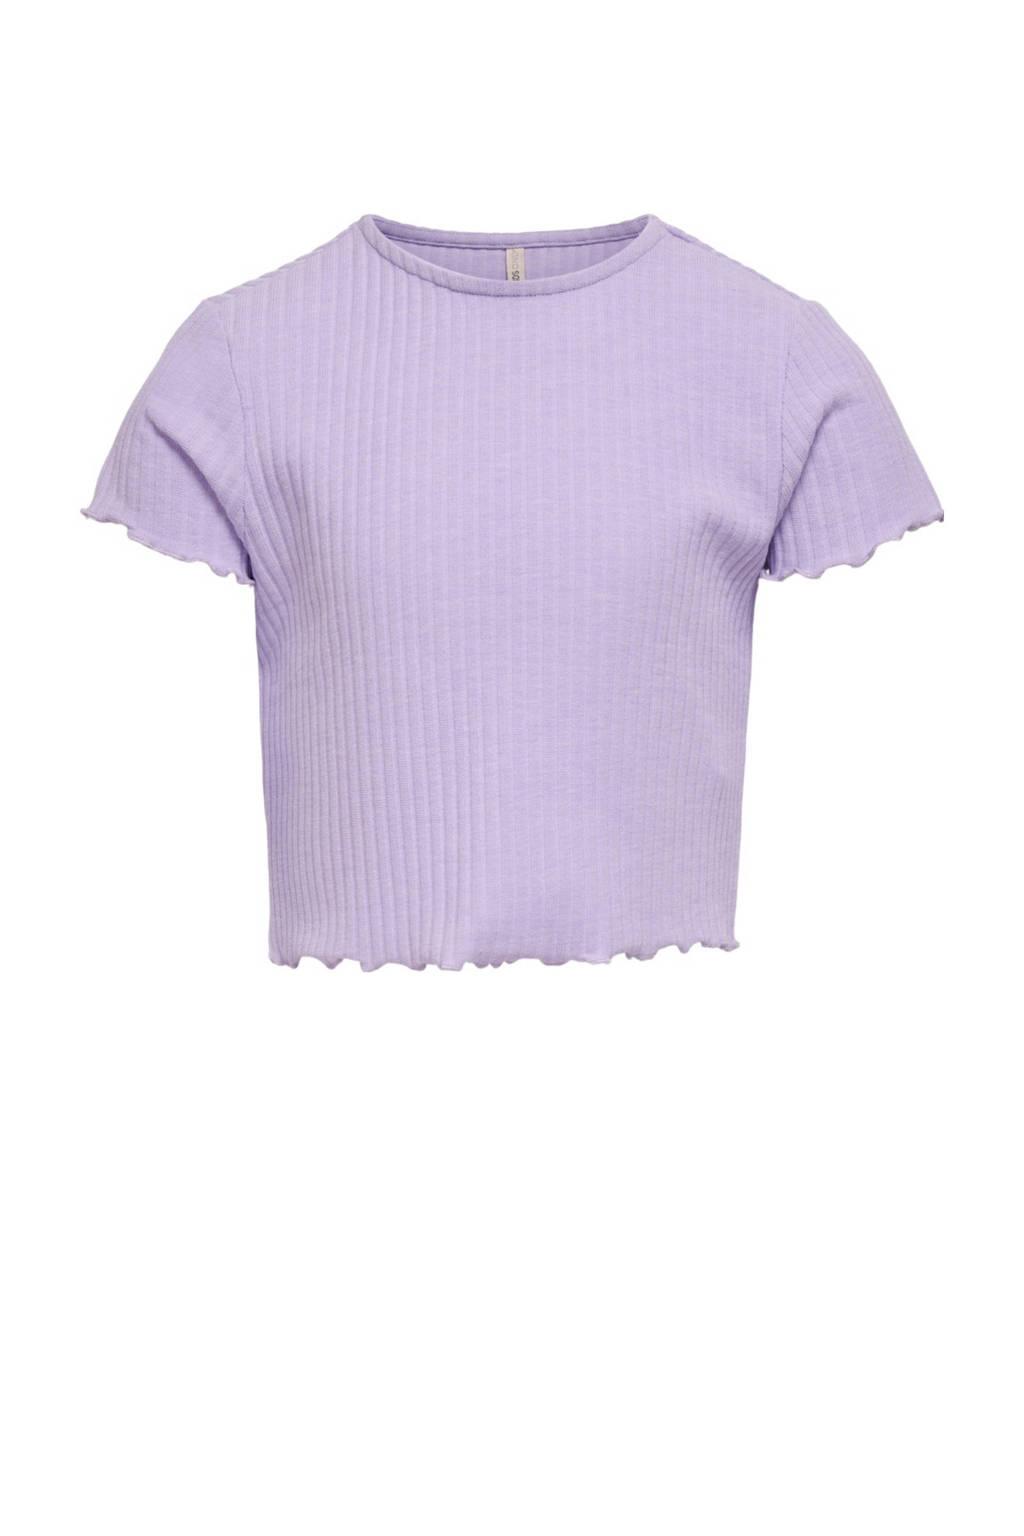 KIDS ONLY ribgebreid T-shirt Nella lila, Lila